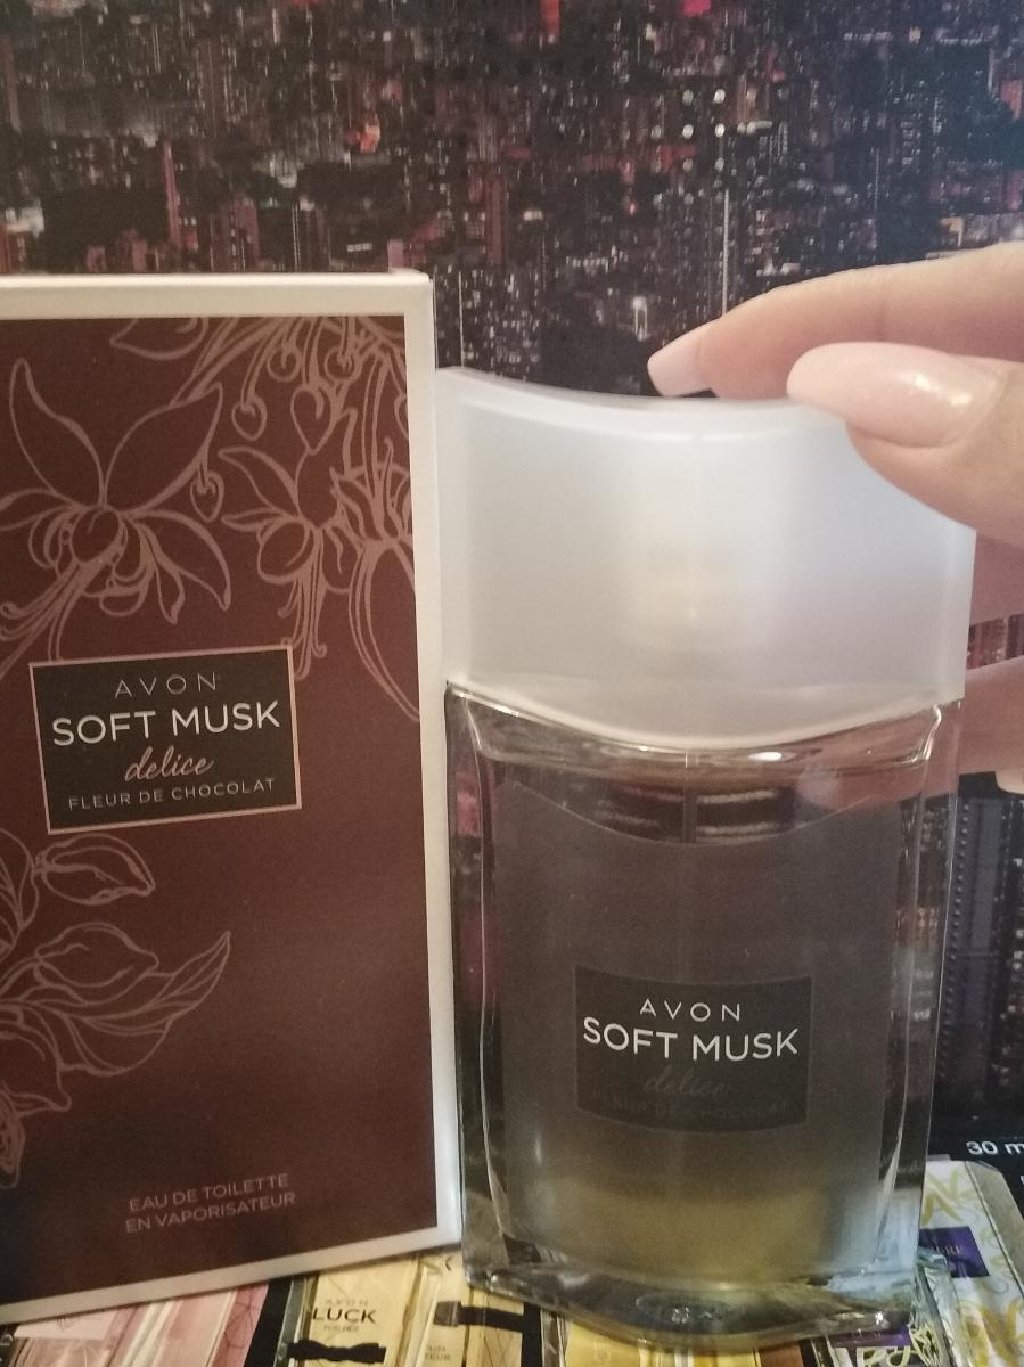 Avon Soft Musk cokoladni 50ml samo jednom prsnut, nov